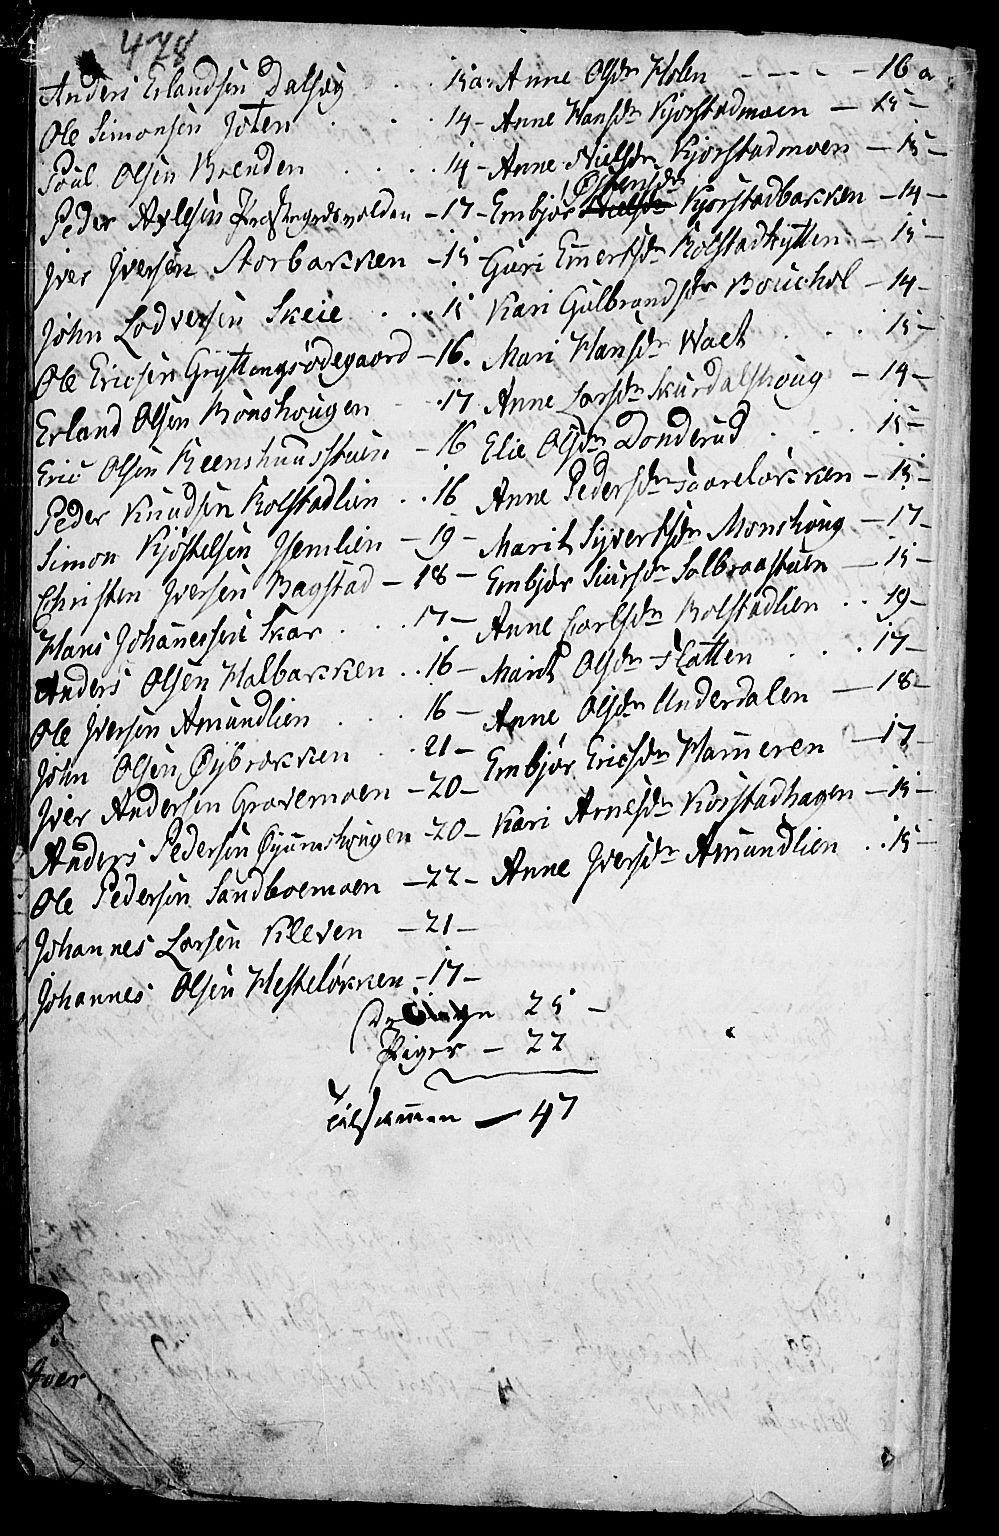 SAH, Fron prestekontor, H/Ha/Haa/L0001: Ministerialbok nr. 1, 1799-1816, s. 478-479